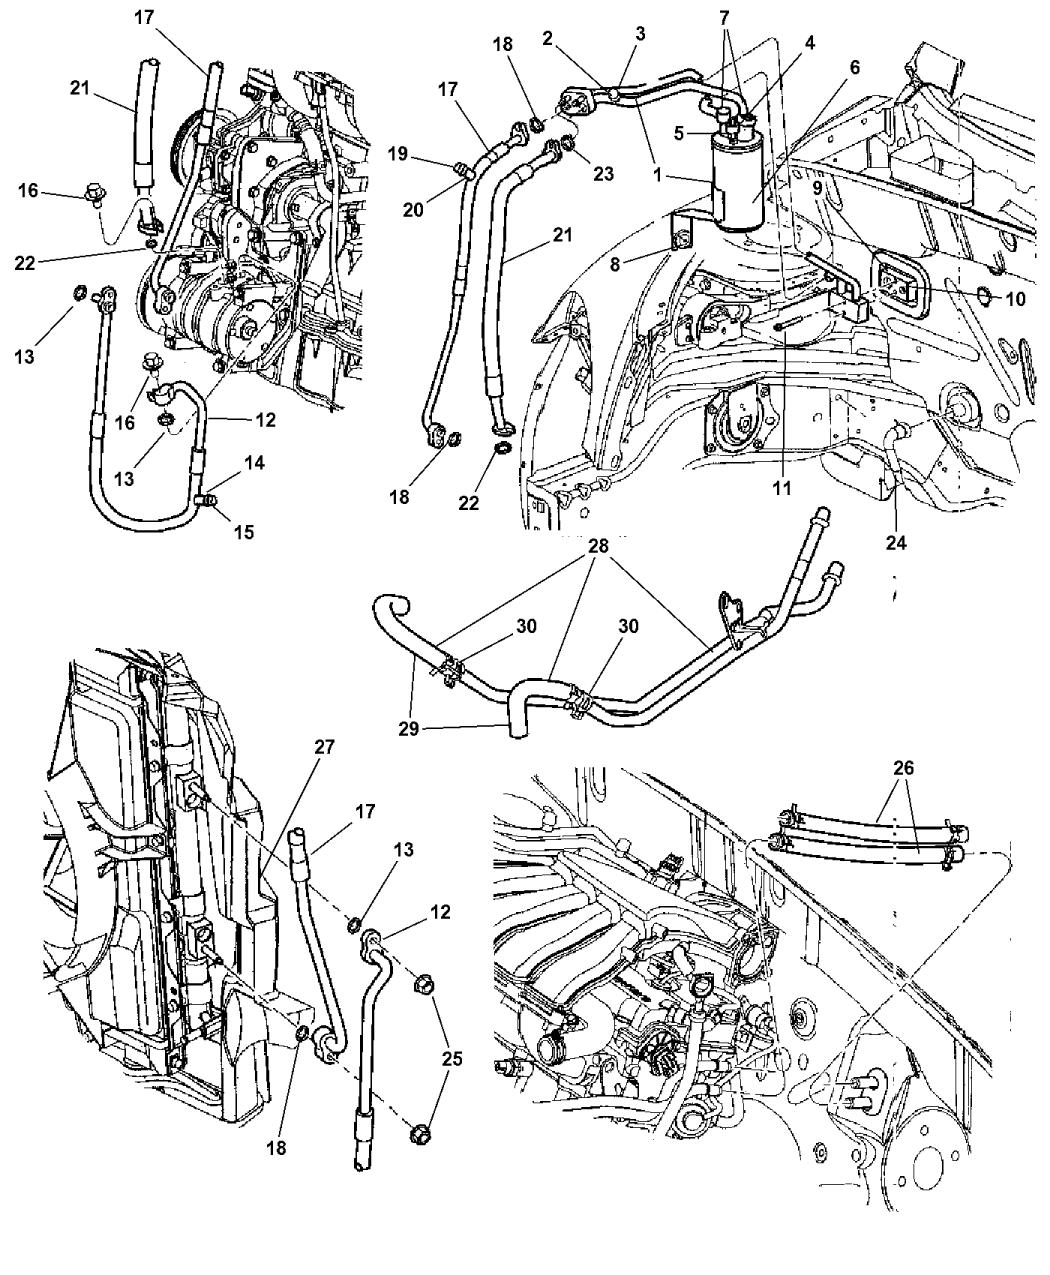 [DIAGRAM_1JK]  6506848AA - Genuine Chrysler CLAMP-HEATER HOSE | 2007 Pt Cruiser Engine Diagram |  | Mopar Parts Giant